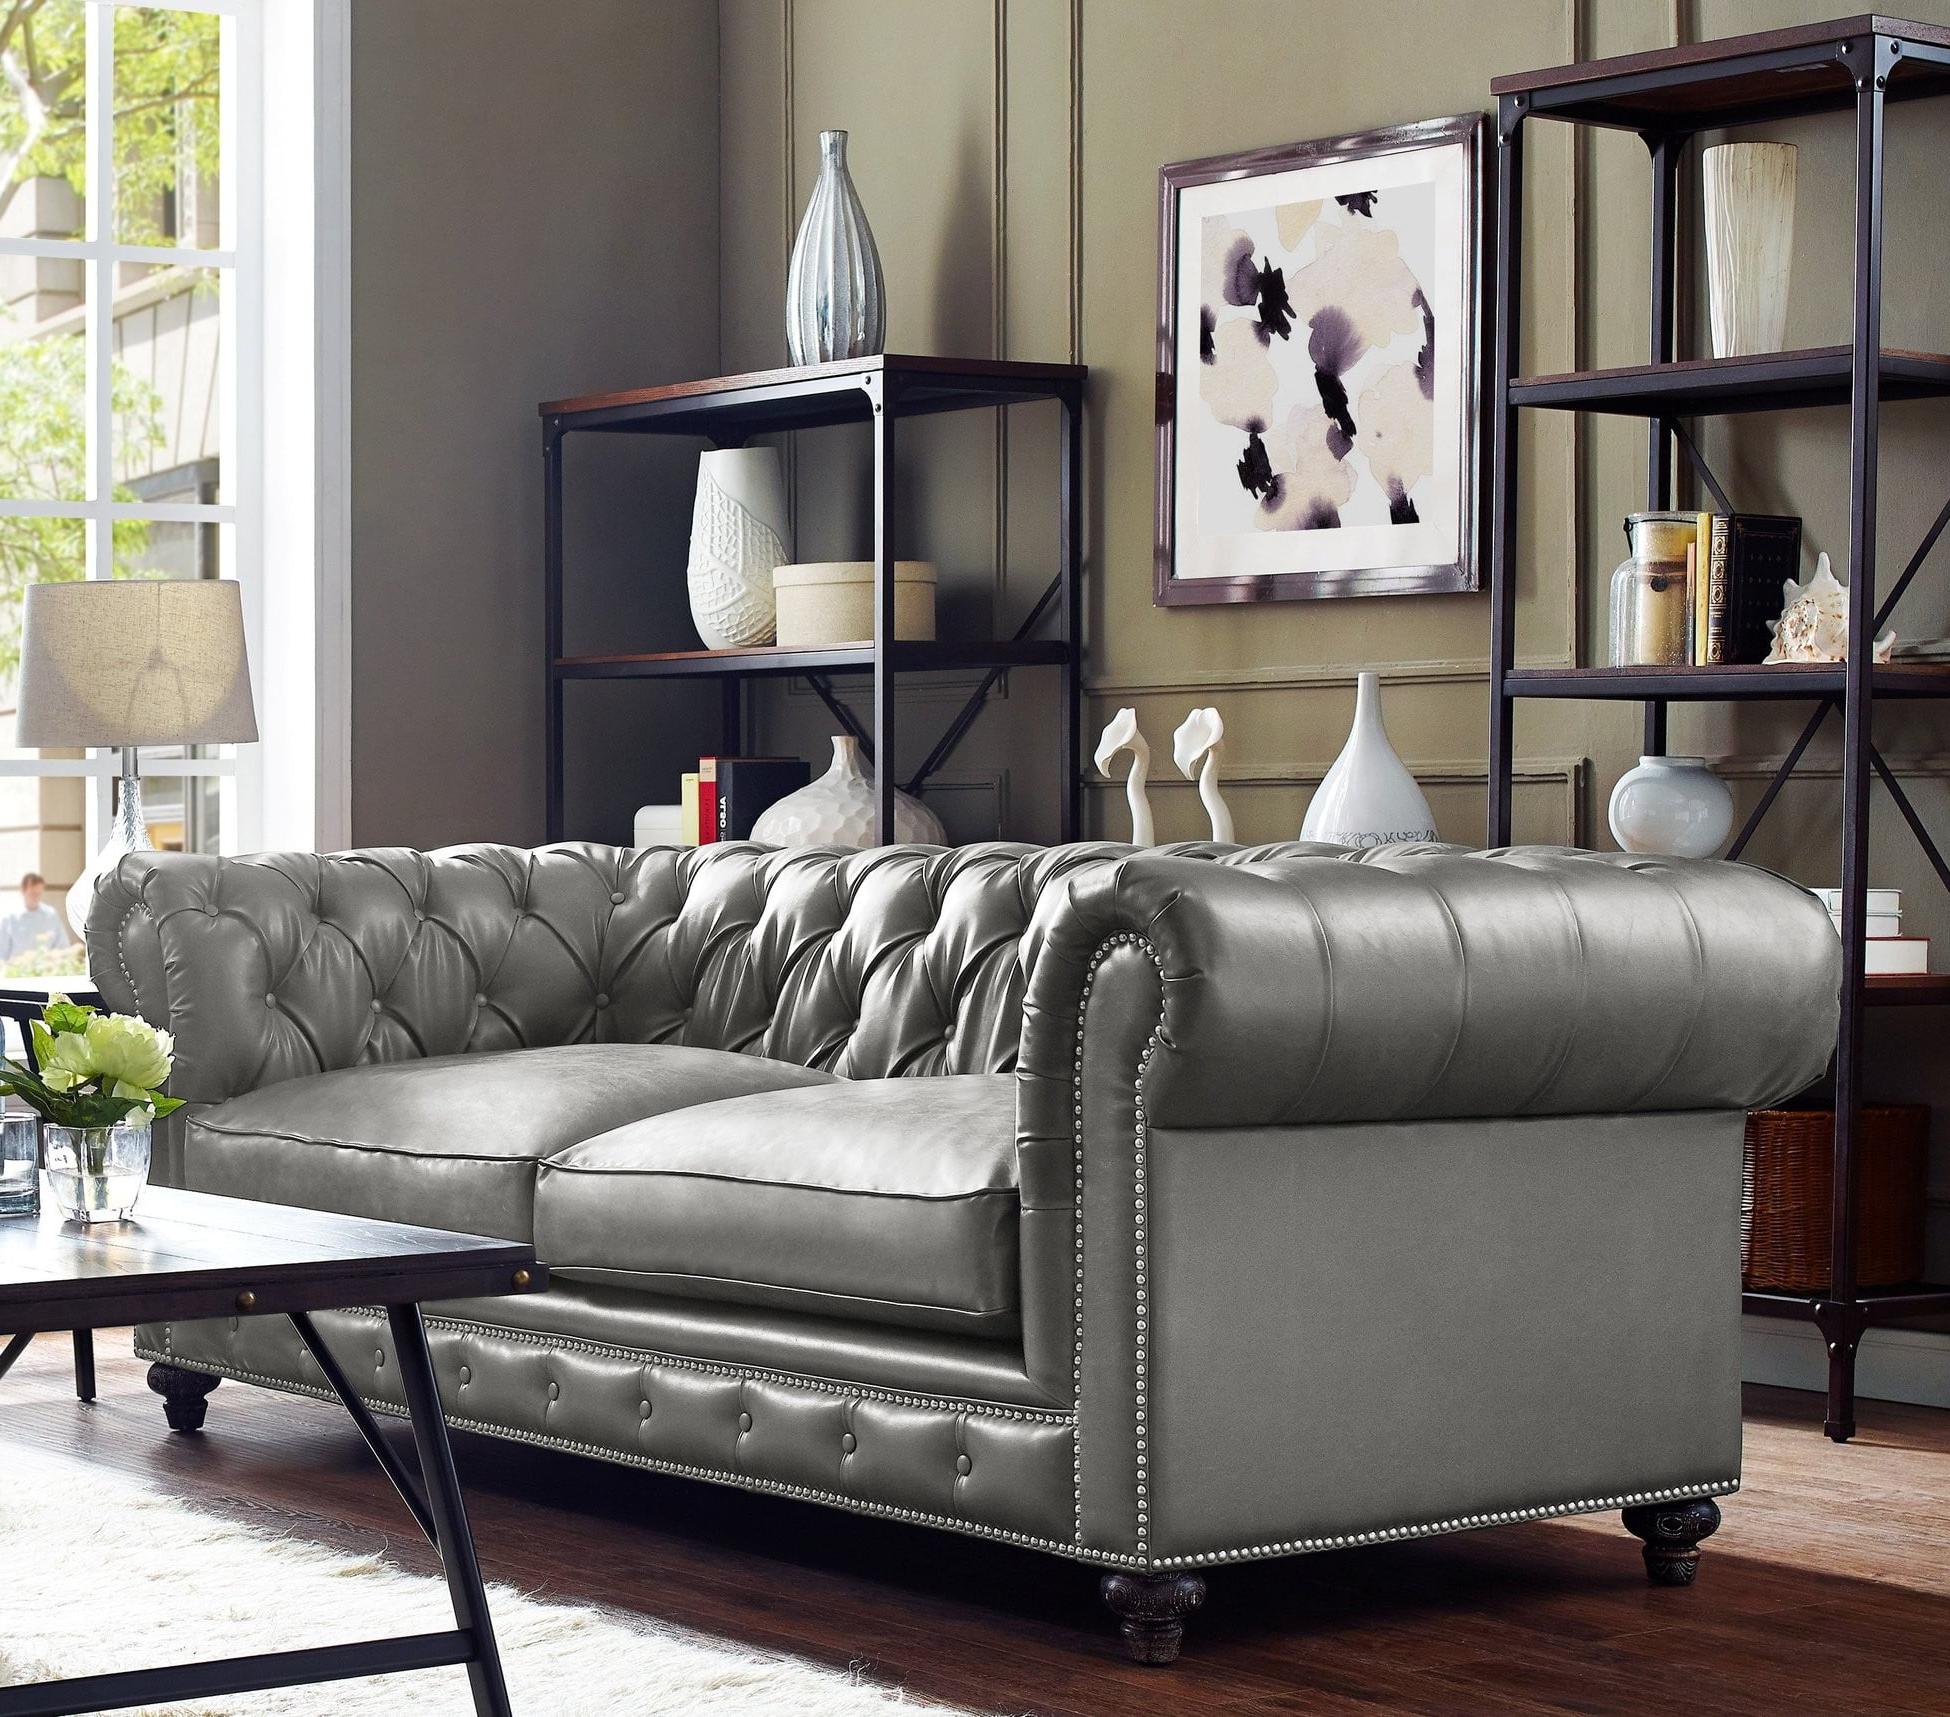 Preferred Durango Rustic Grey Leather Sofa, S98, Tov Furniture In Gray Sofas (View 5 of 15)